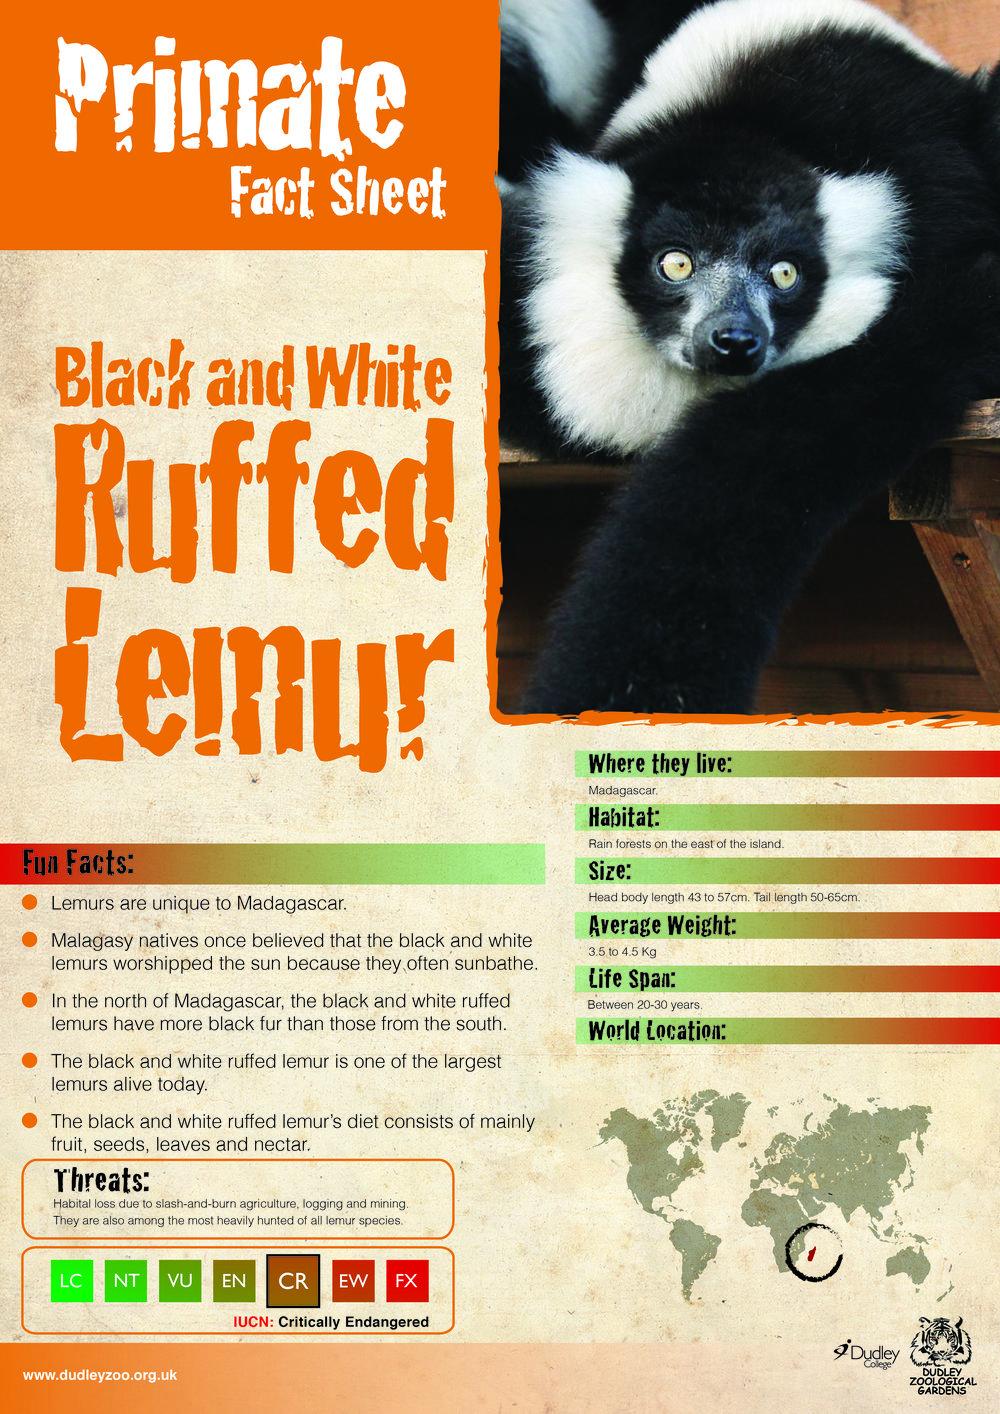 Caron's Black and White Ruffed Lemur-01.jpg